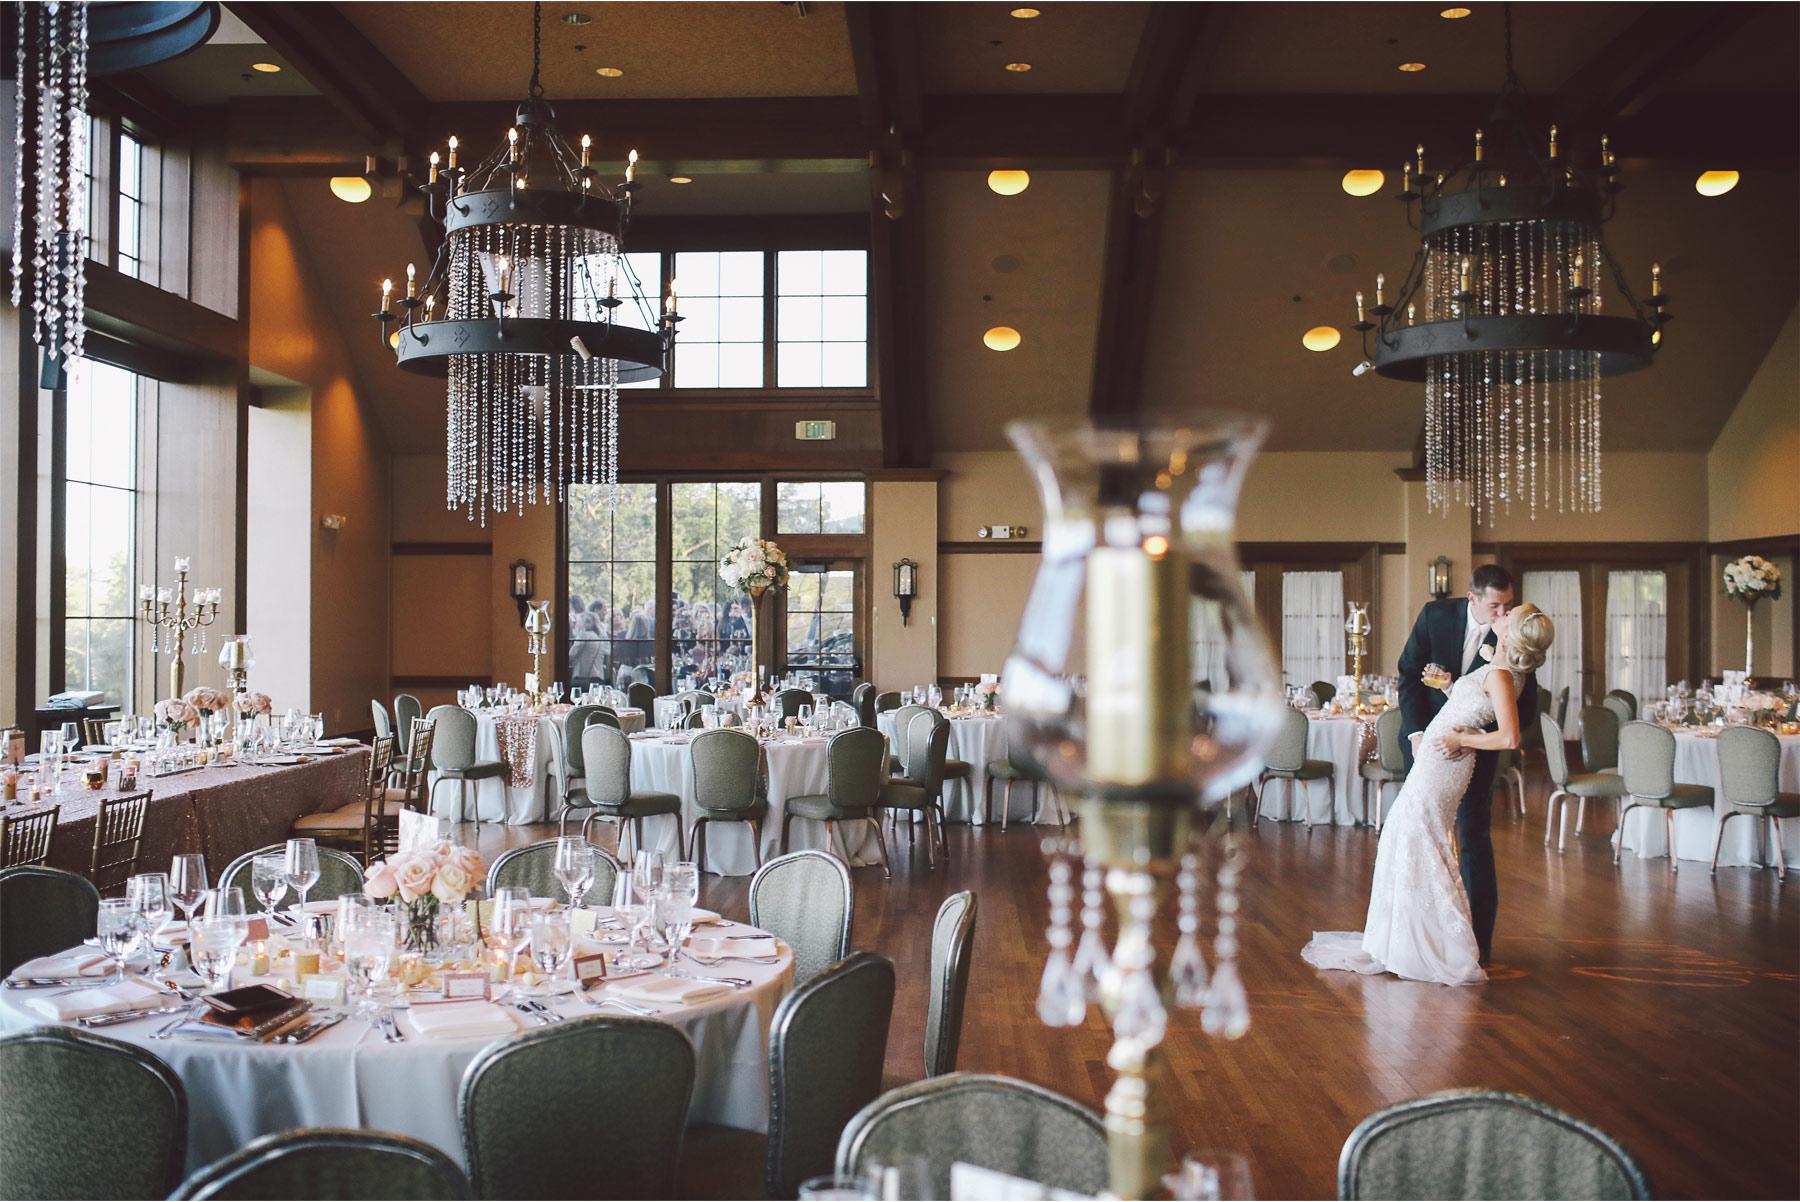 19-Minneapolis-Minnesota-Wedding-Photography-by-Vick-Photography-Golf-Course-Interlachen-Country-Club--Reception-Decor-Jenna-and-Josh.jpg